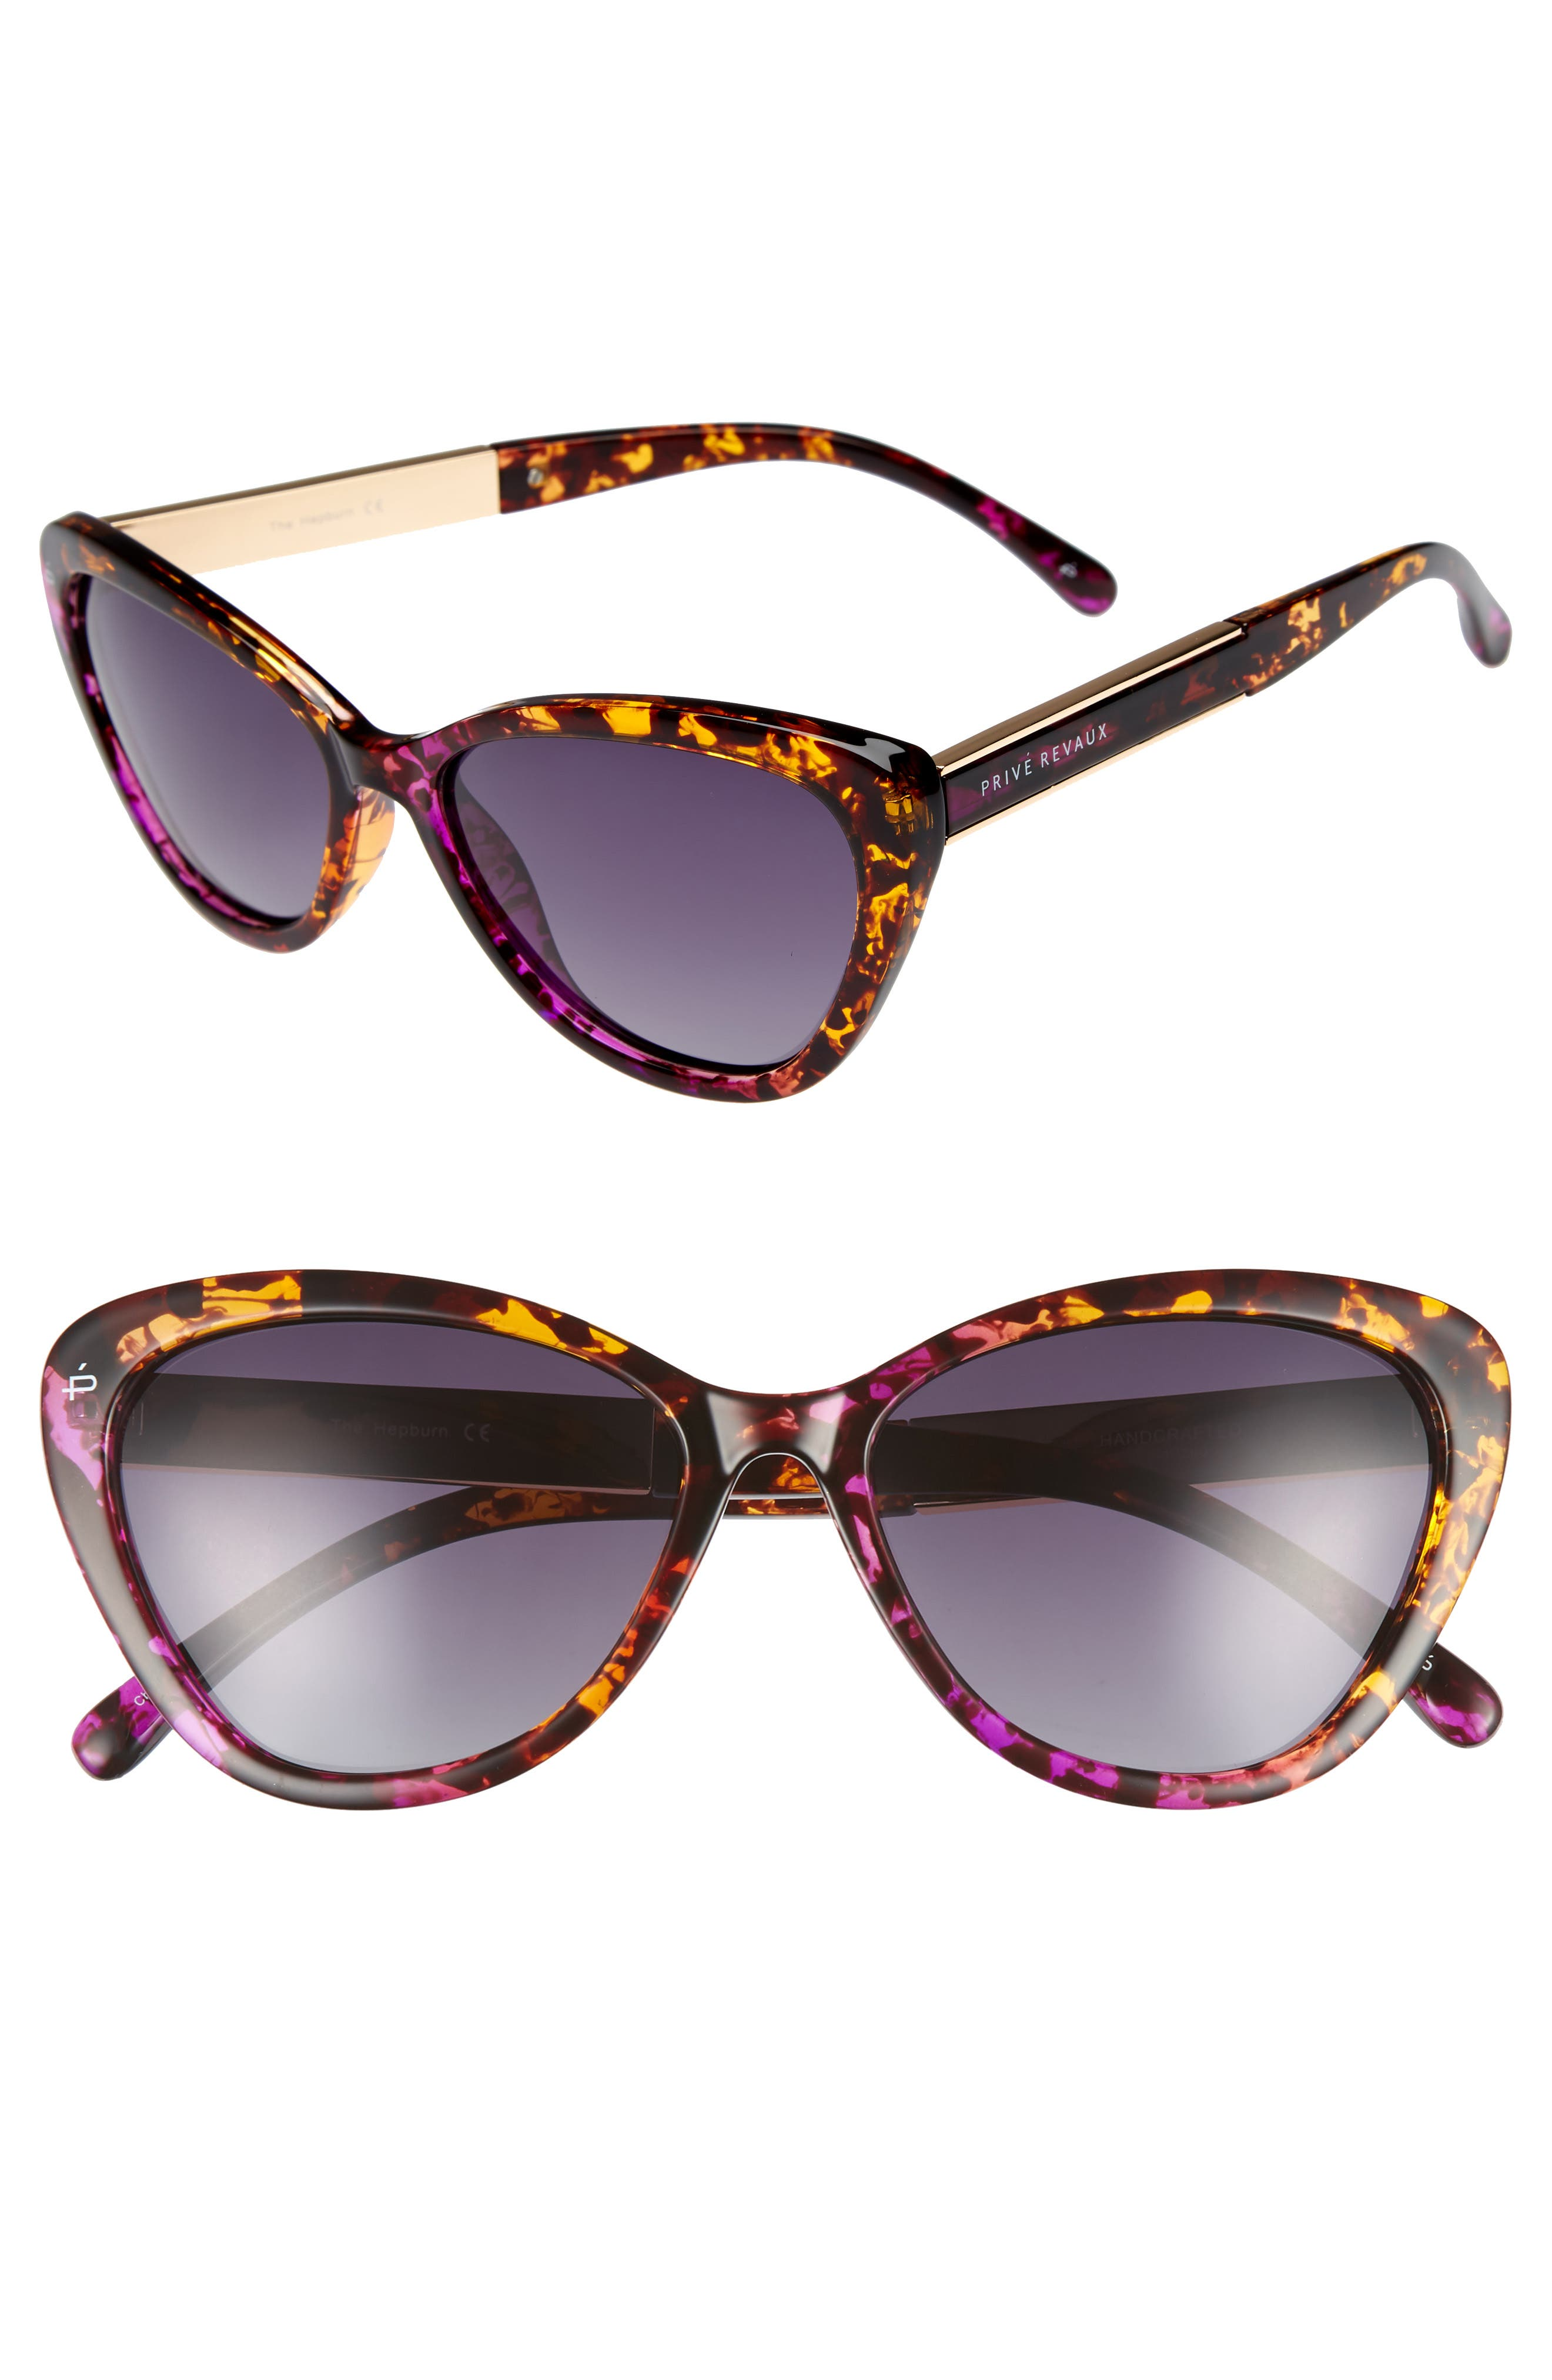 Privé Revaux The Hepburn 56mm Cat Eye Sunglasses